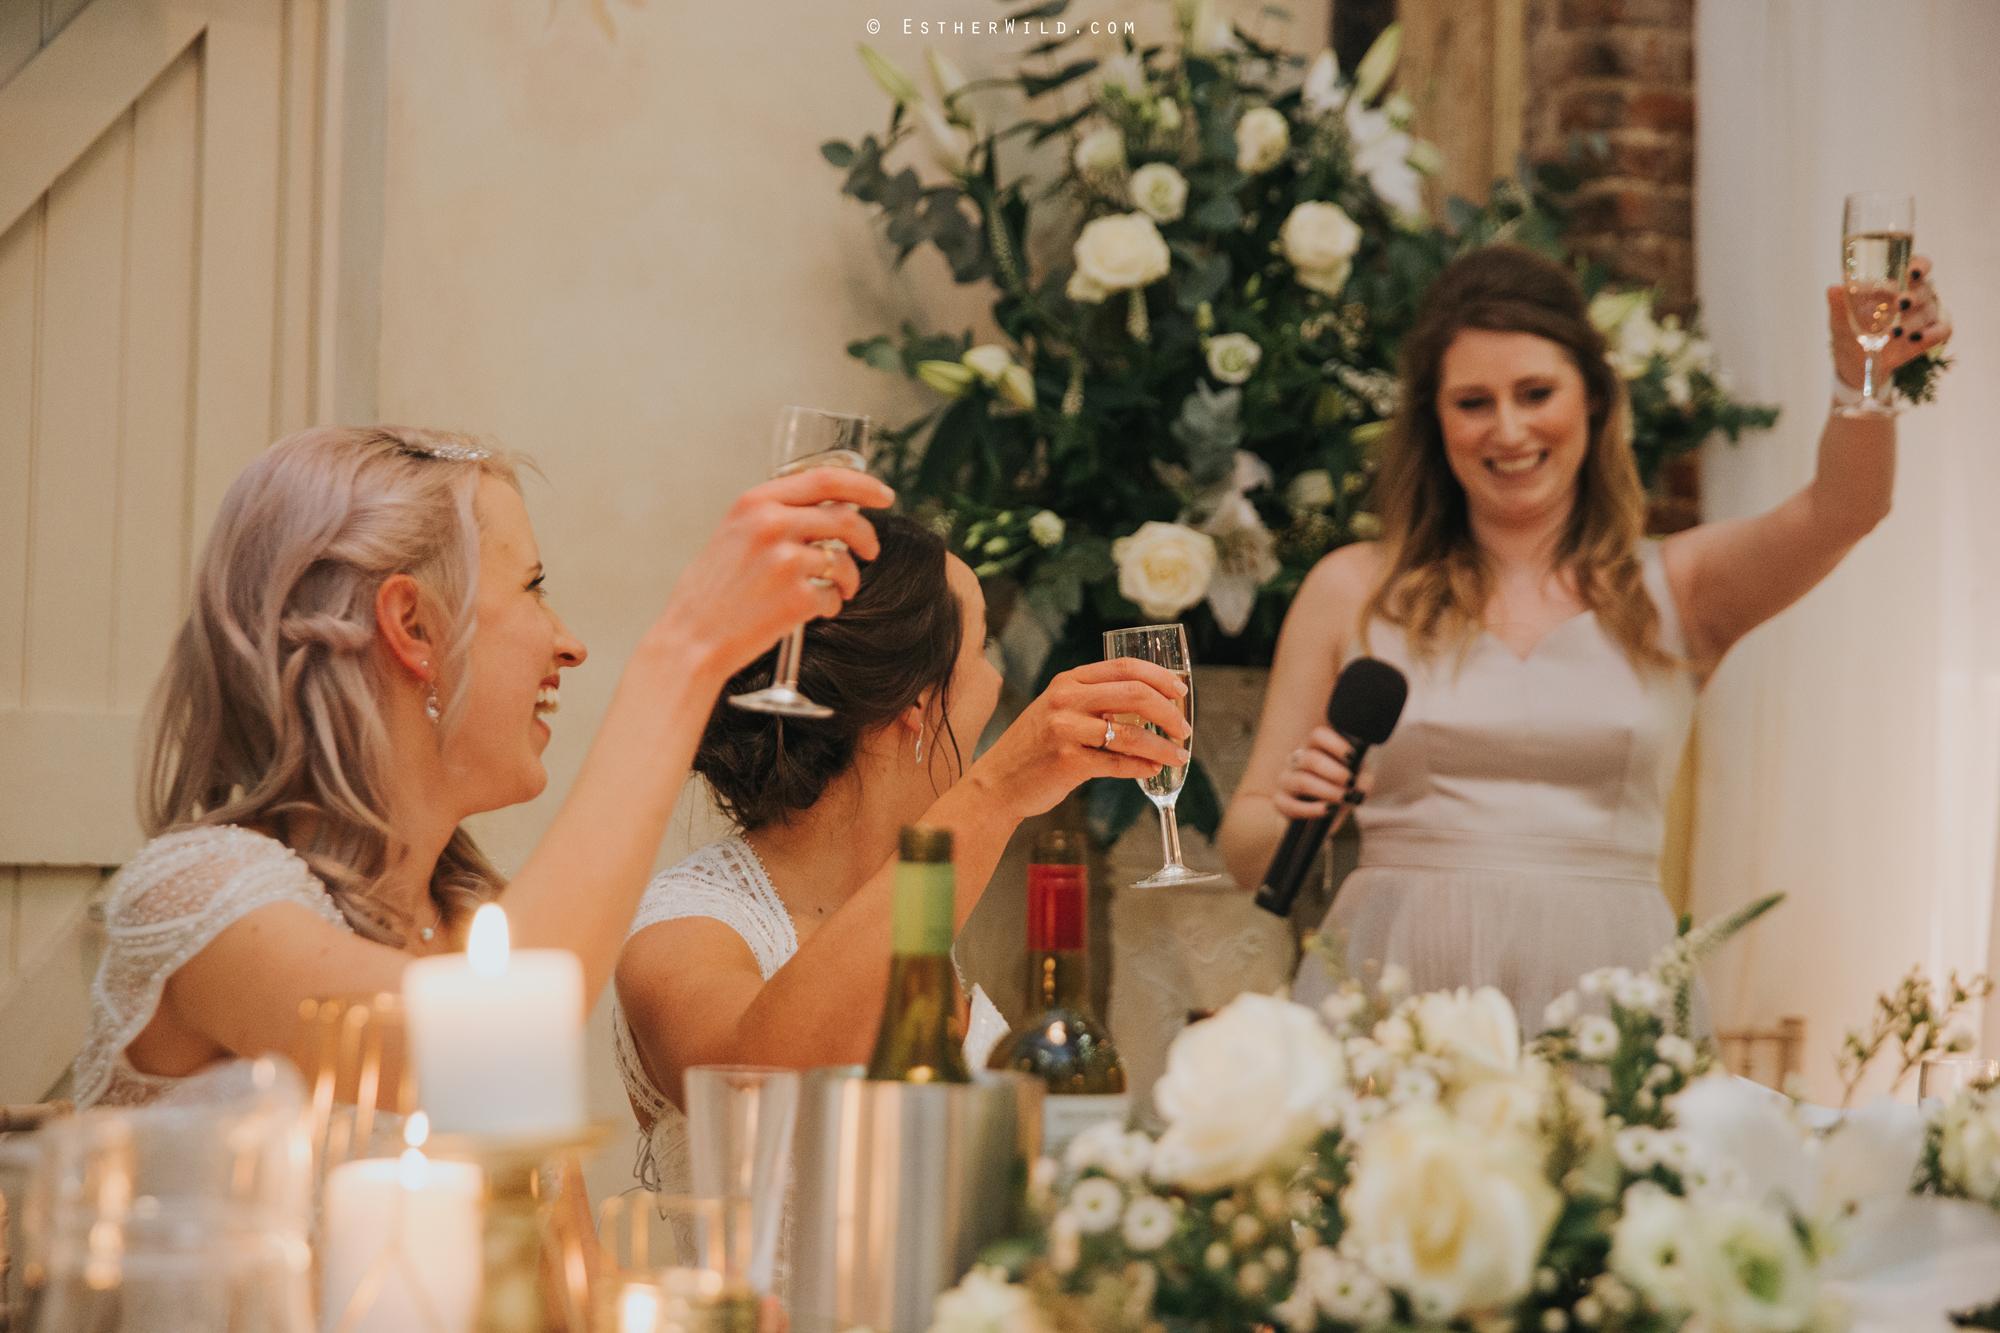 Elms_Barn_Weddings_Suffolk_Photographer_Copyright_Esther_Wild_IMG_2741.jpg